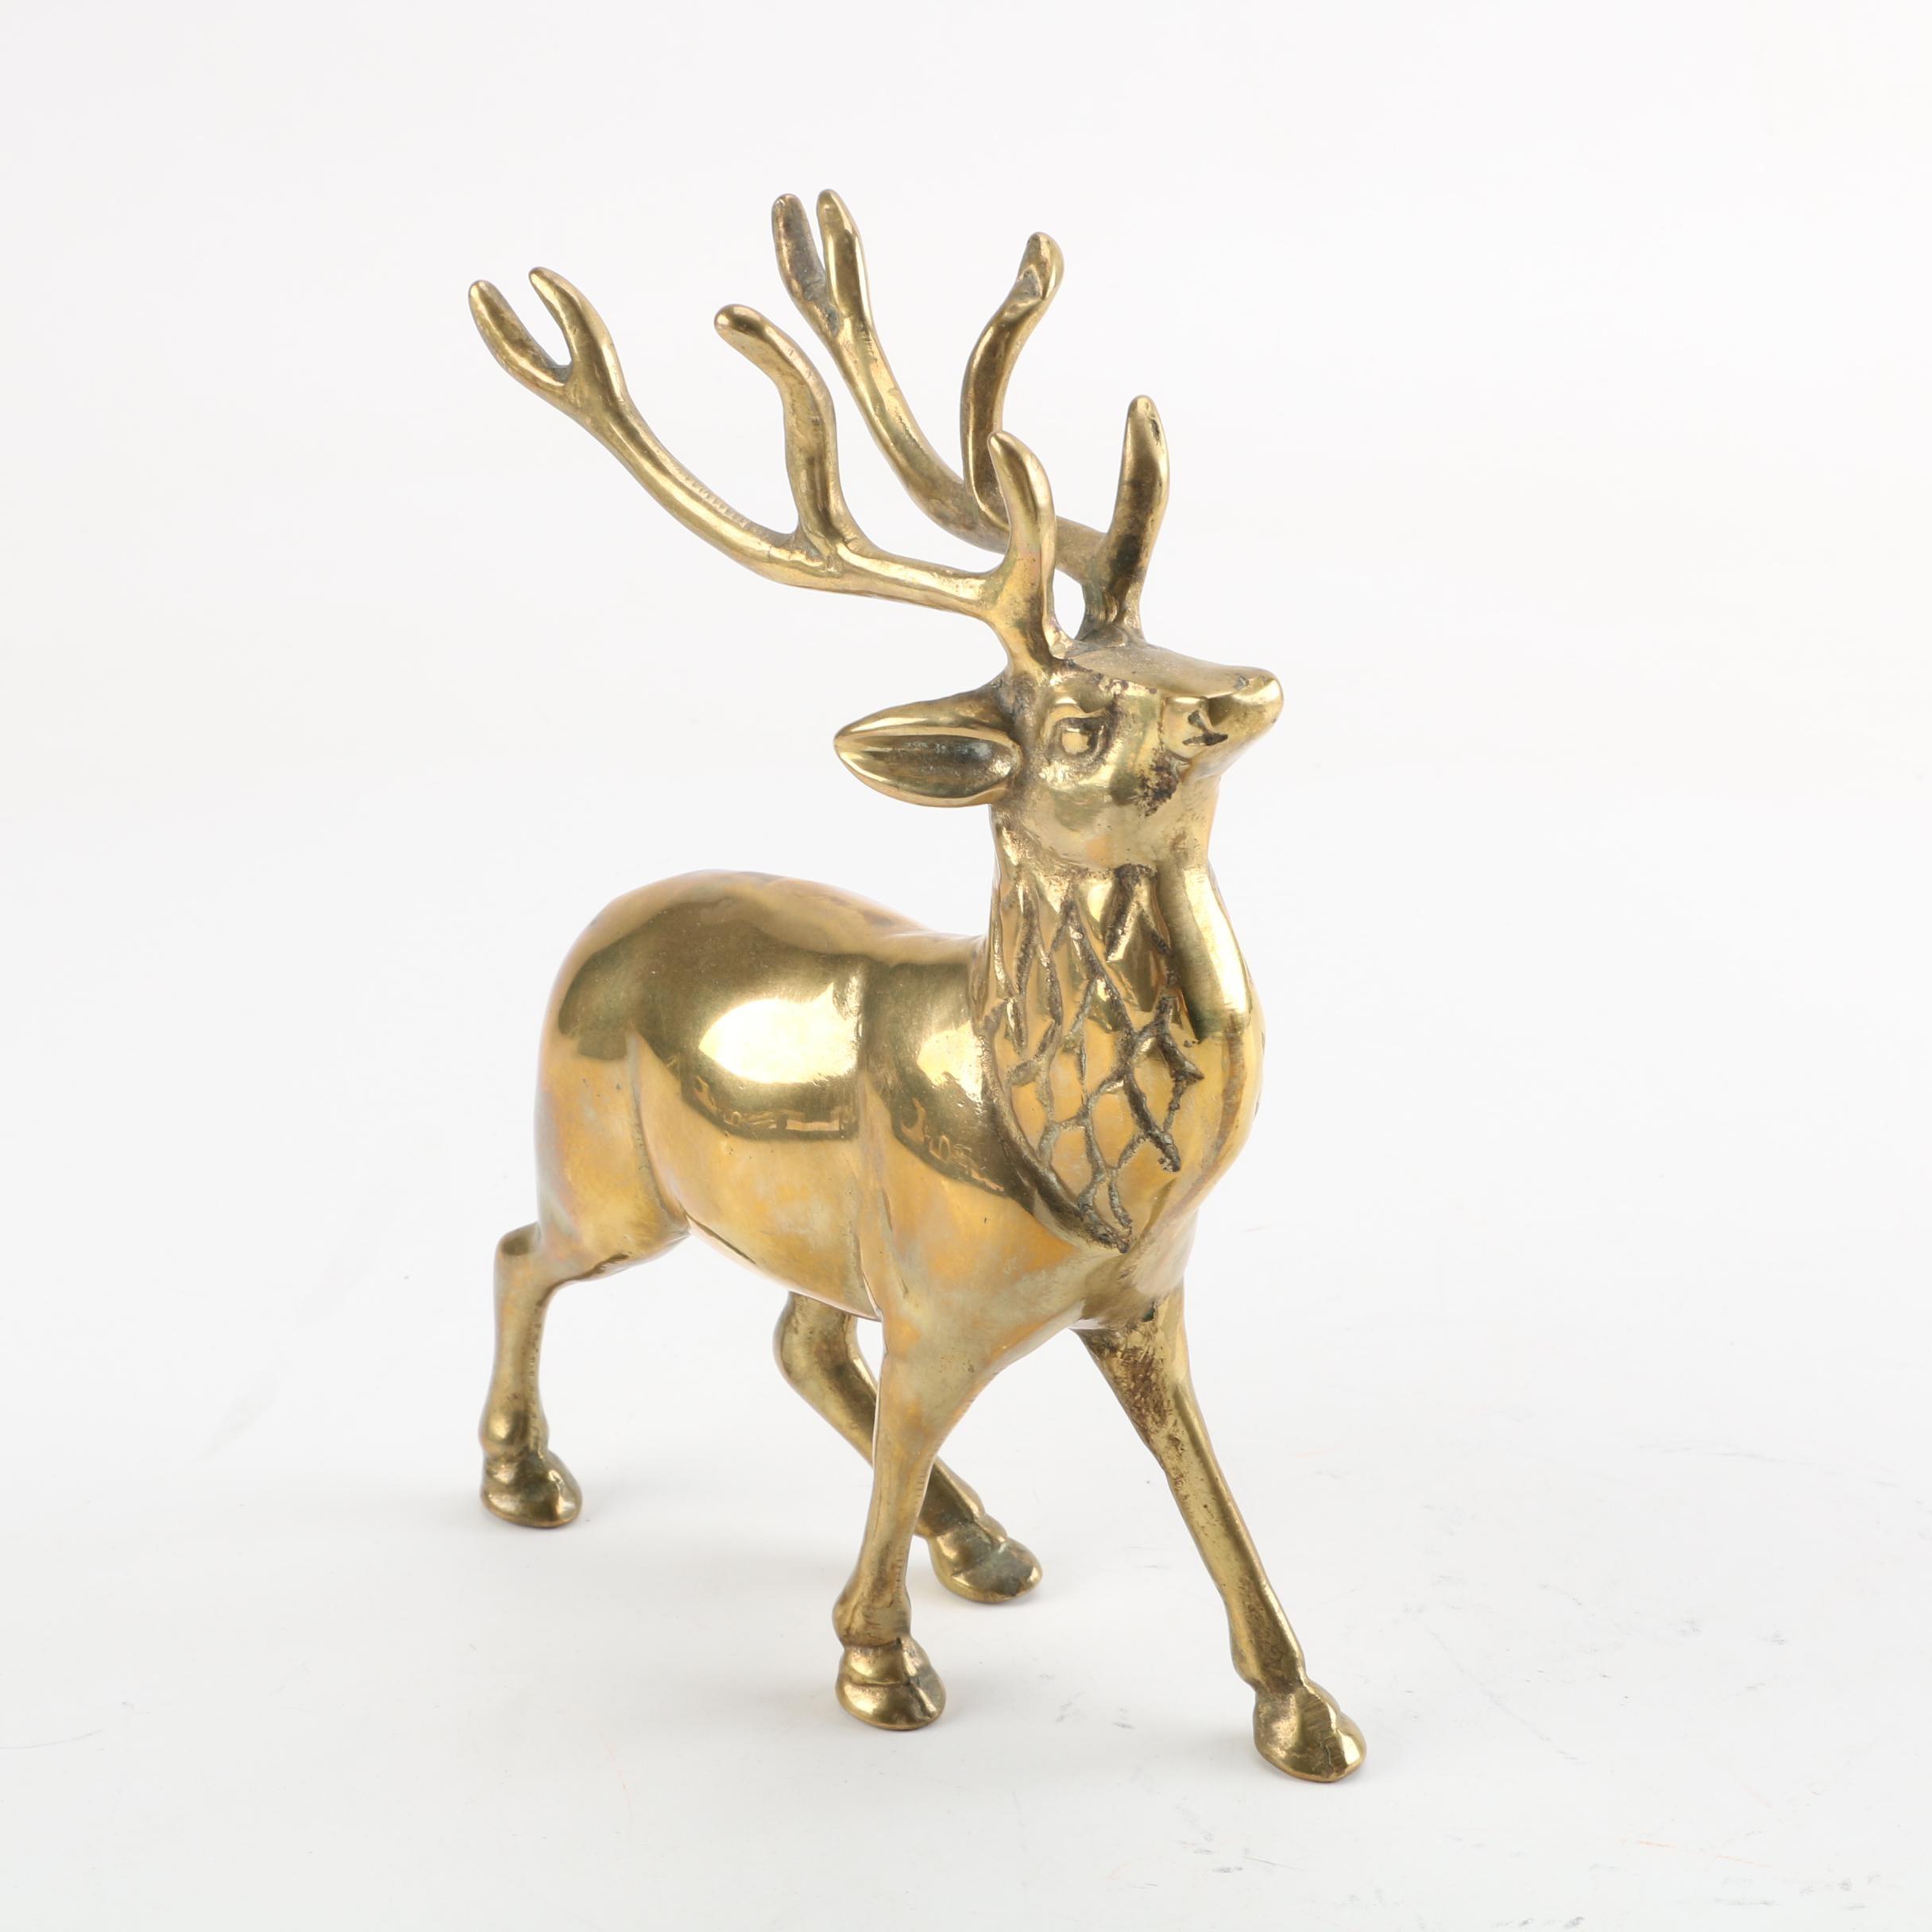 Brass Reindeer Figurine